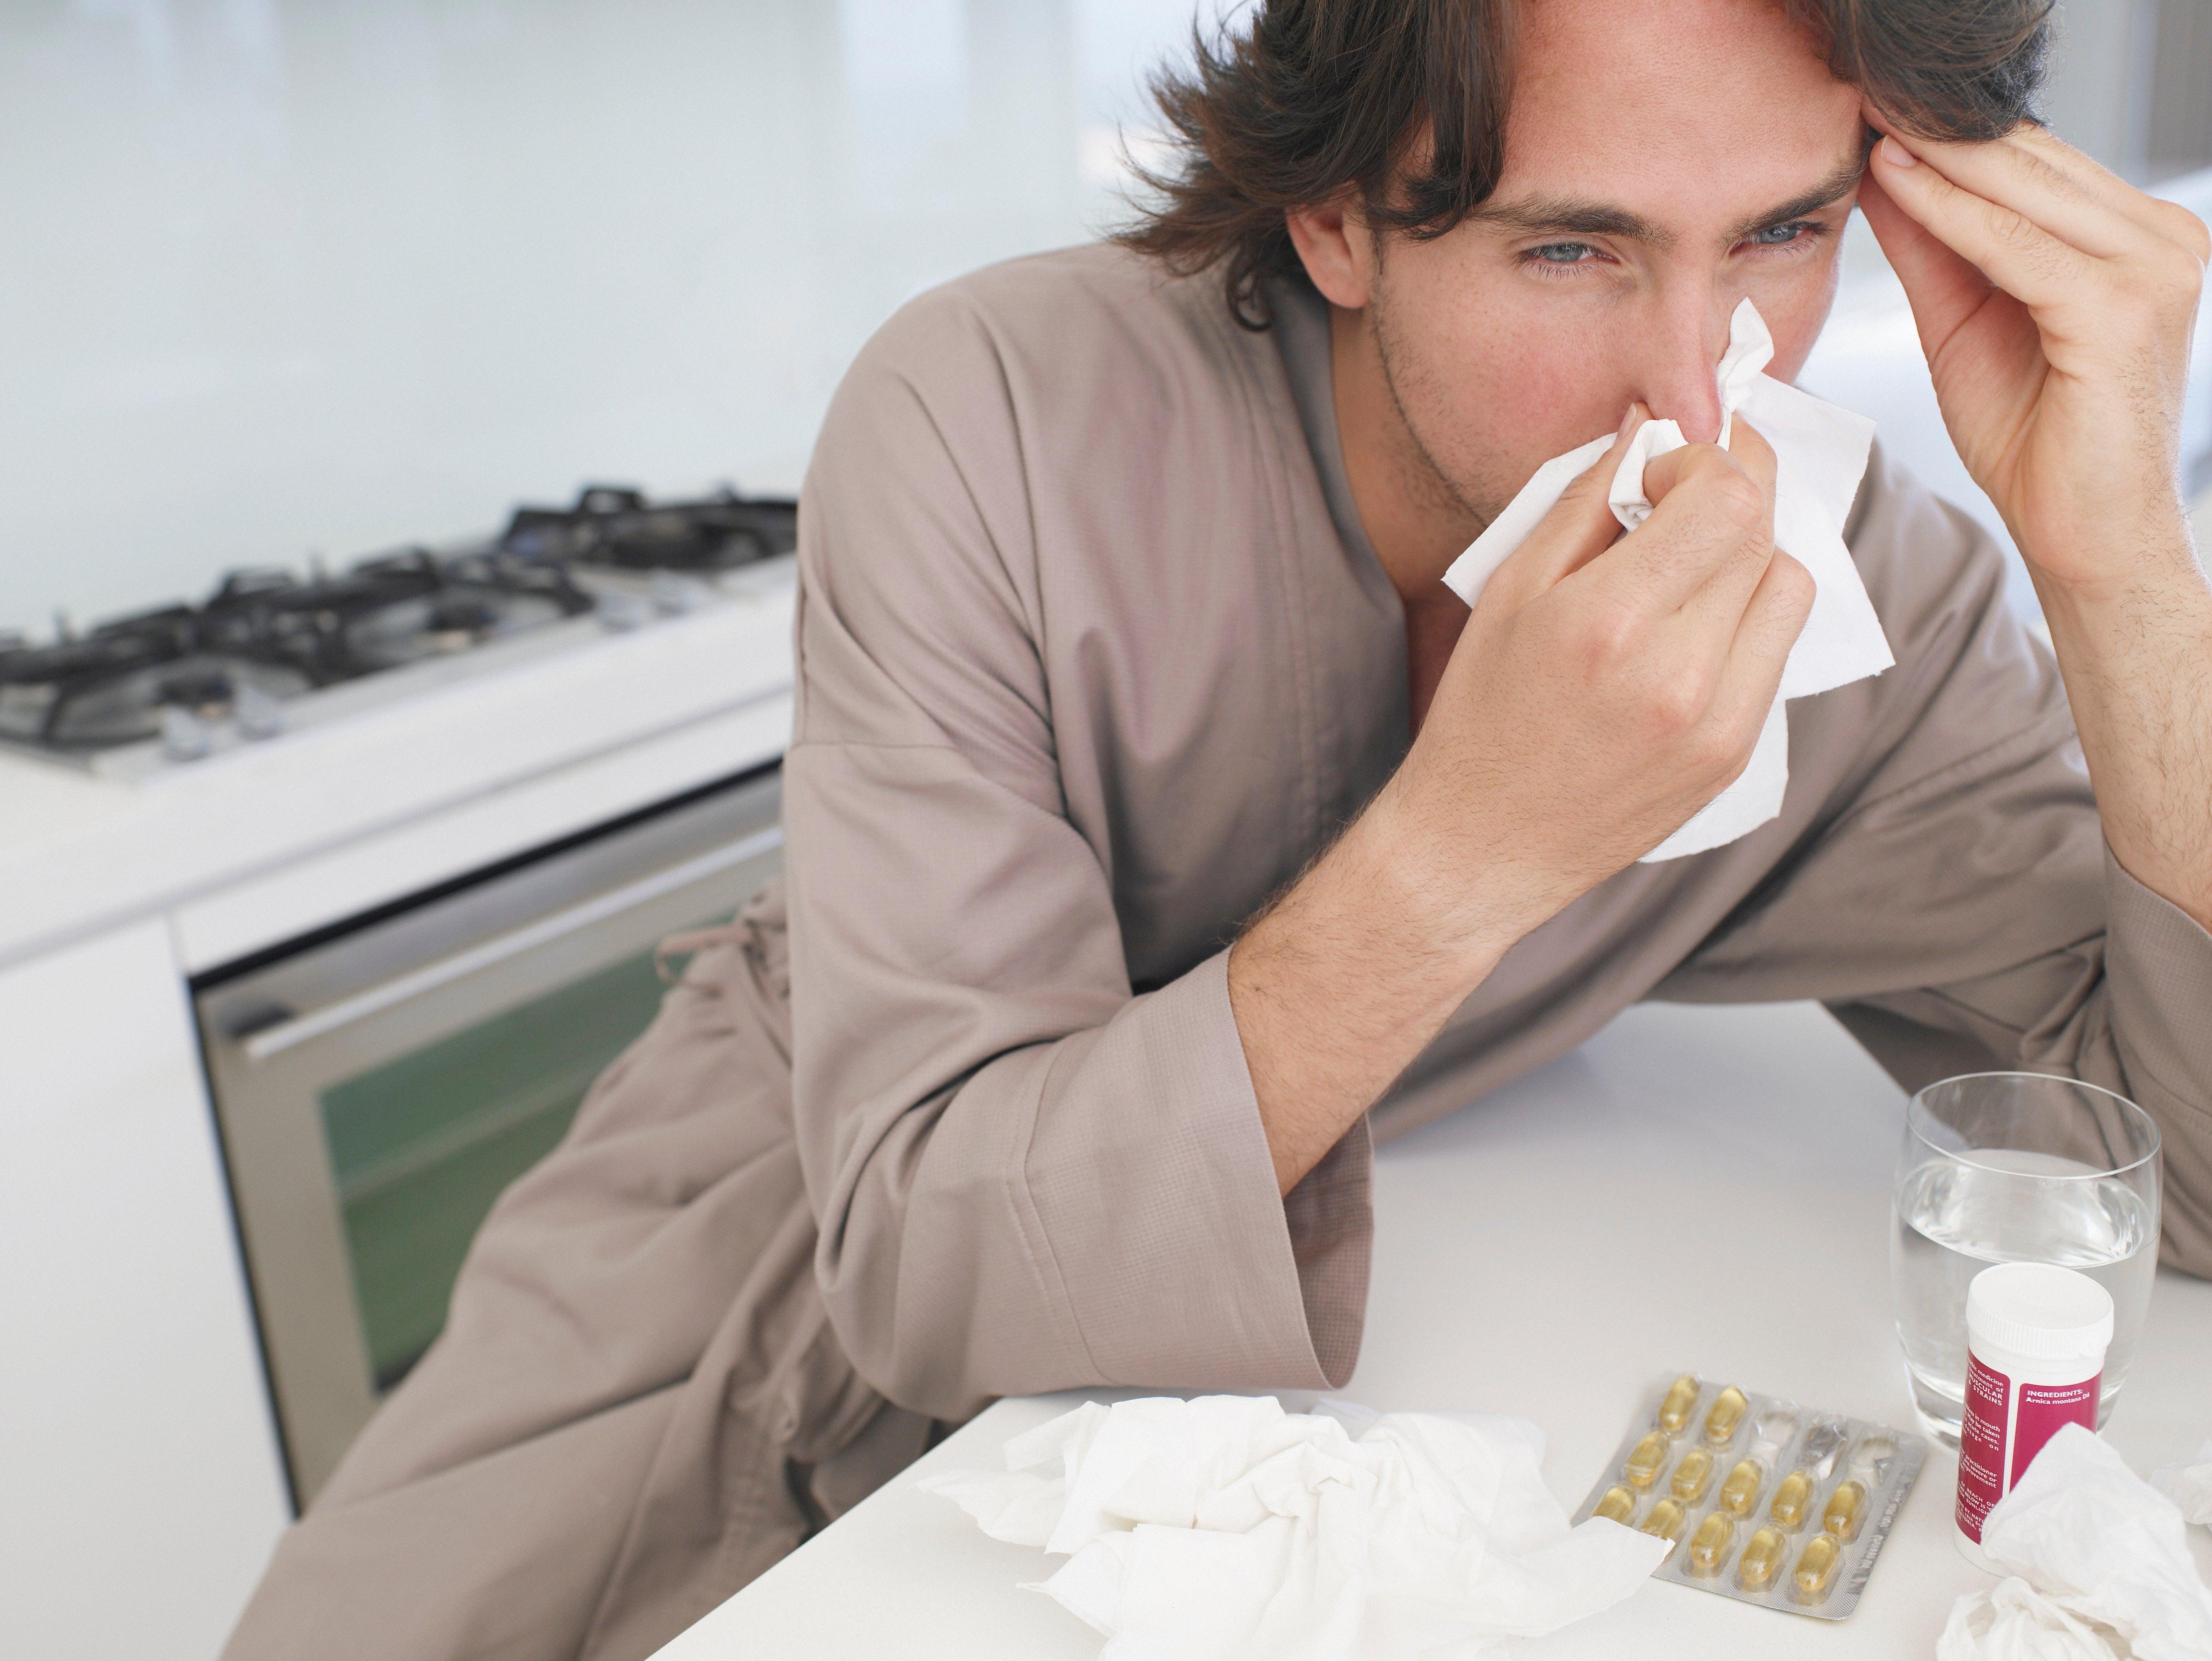 man-cold-sick.jpg